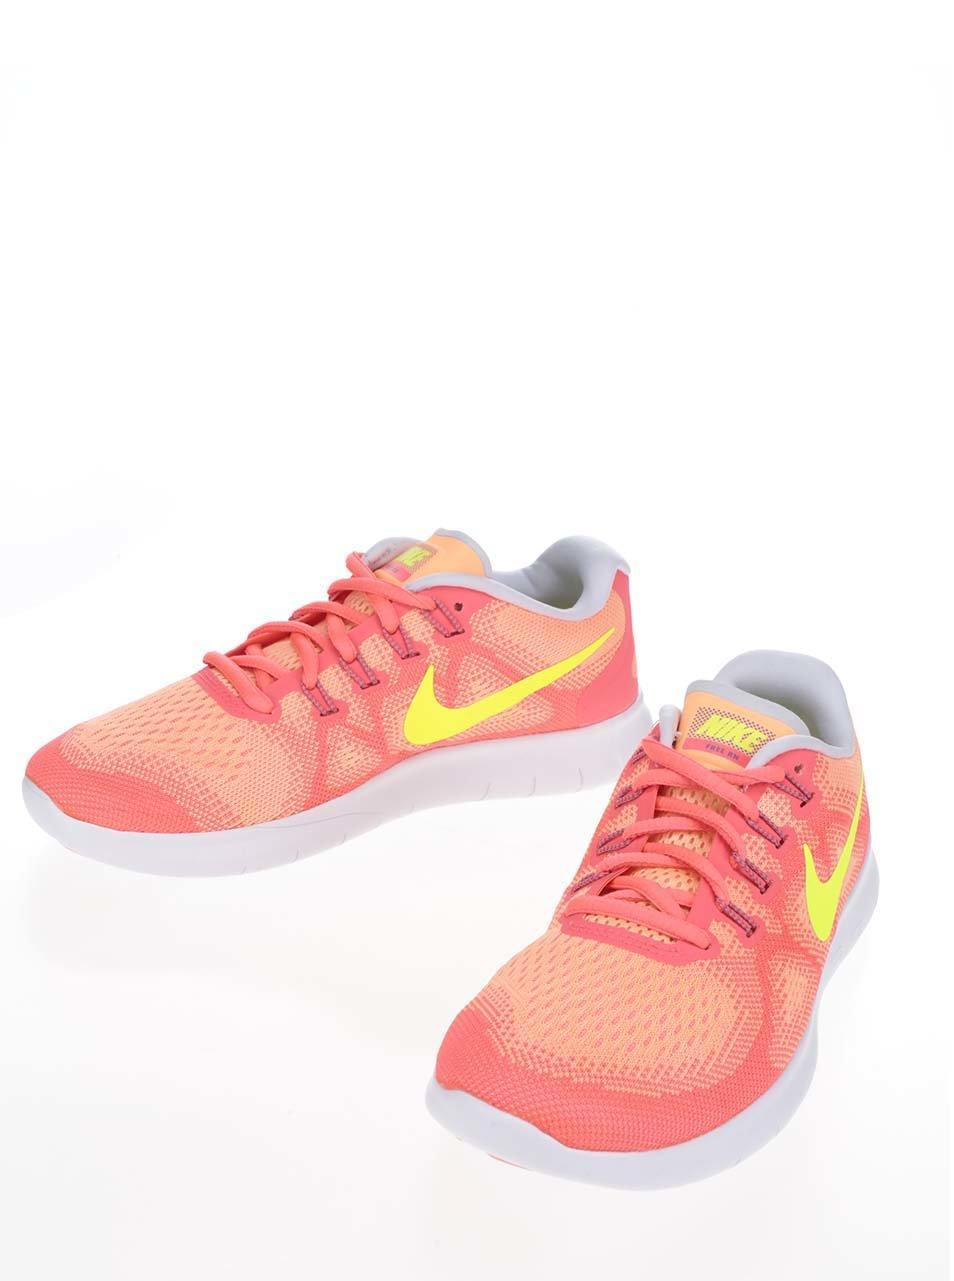 3c2f29d1c3b27 Oranžové dámske tenisky s logom Nike Free Commuter   ZOOT.sk